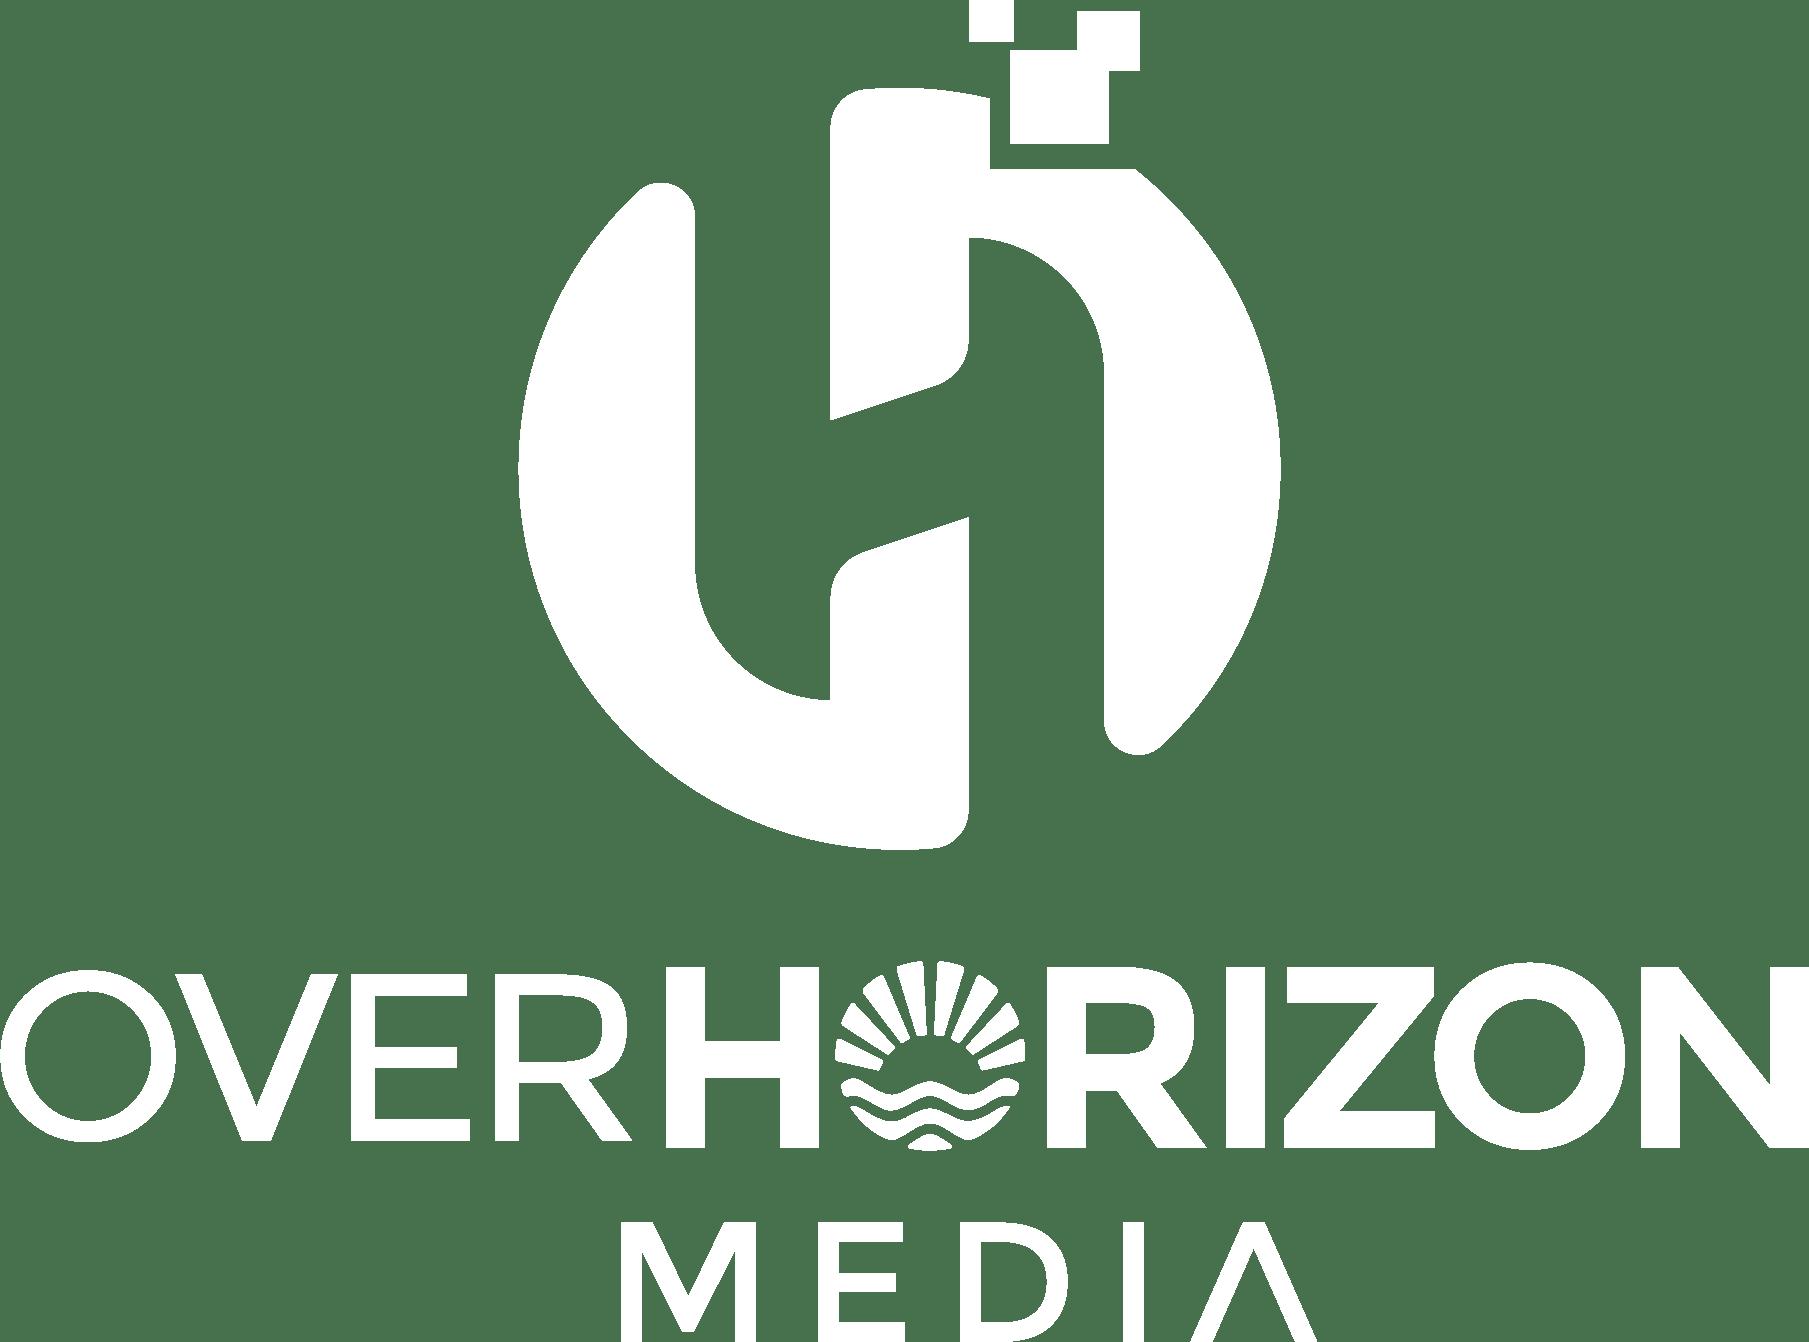 Overhorizon Media